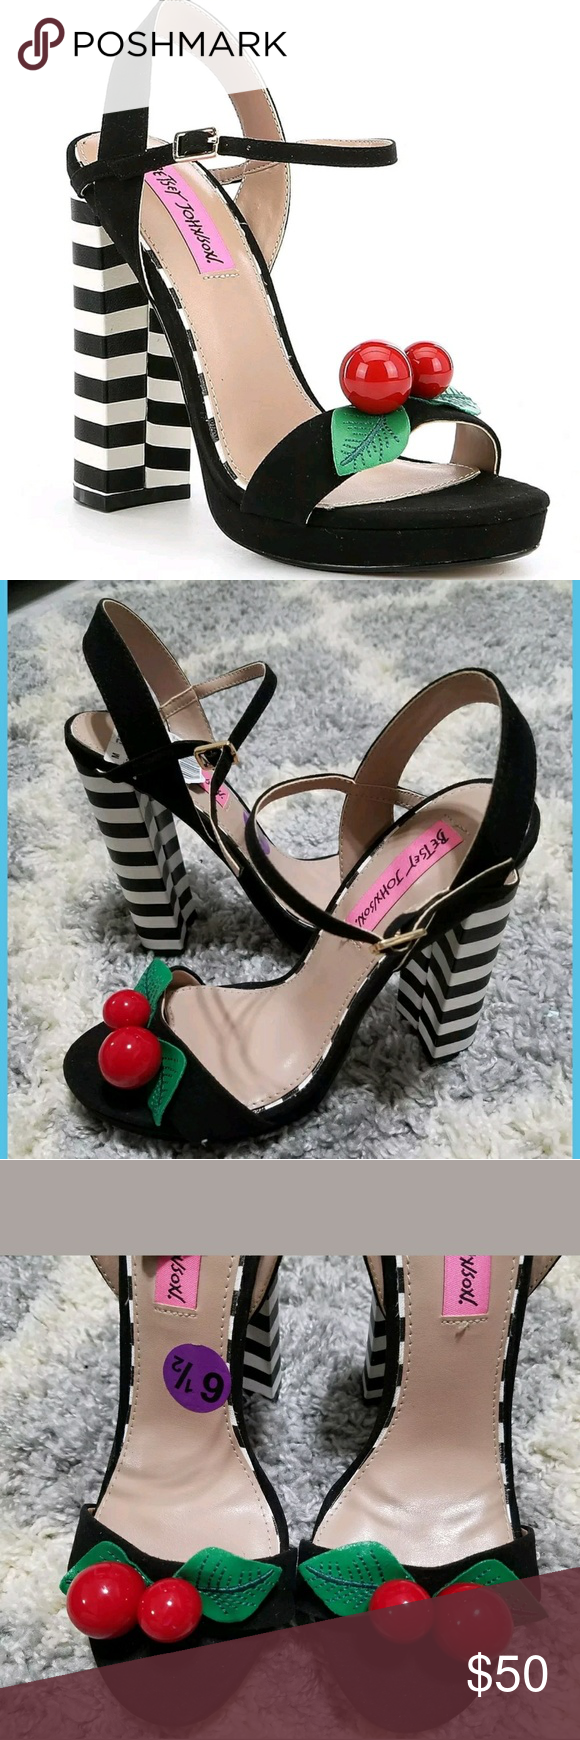 ff70fb4a859 Betsey Johnson Izzie Cherry heels sandles 6.5 Betsey Johnson Women s Izzie  Dress Sandal Heel Wild Cherry